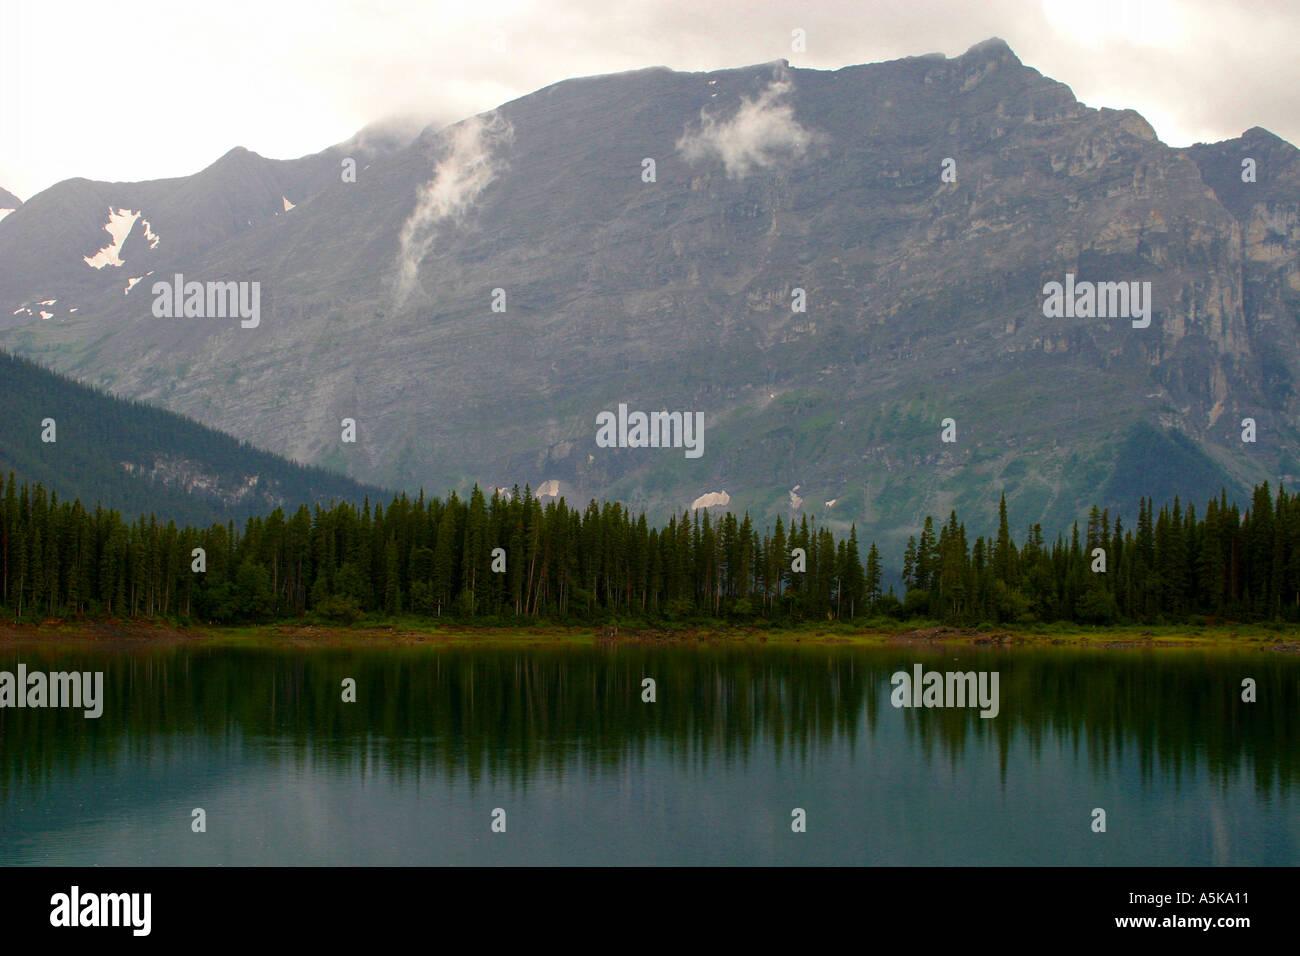 Horizontal     Kananaskis Lake in the Canadian Rockies - Stock Image